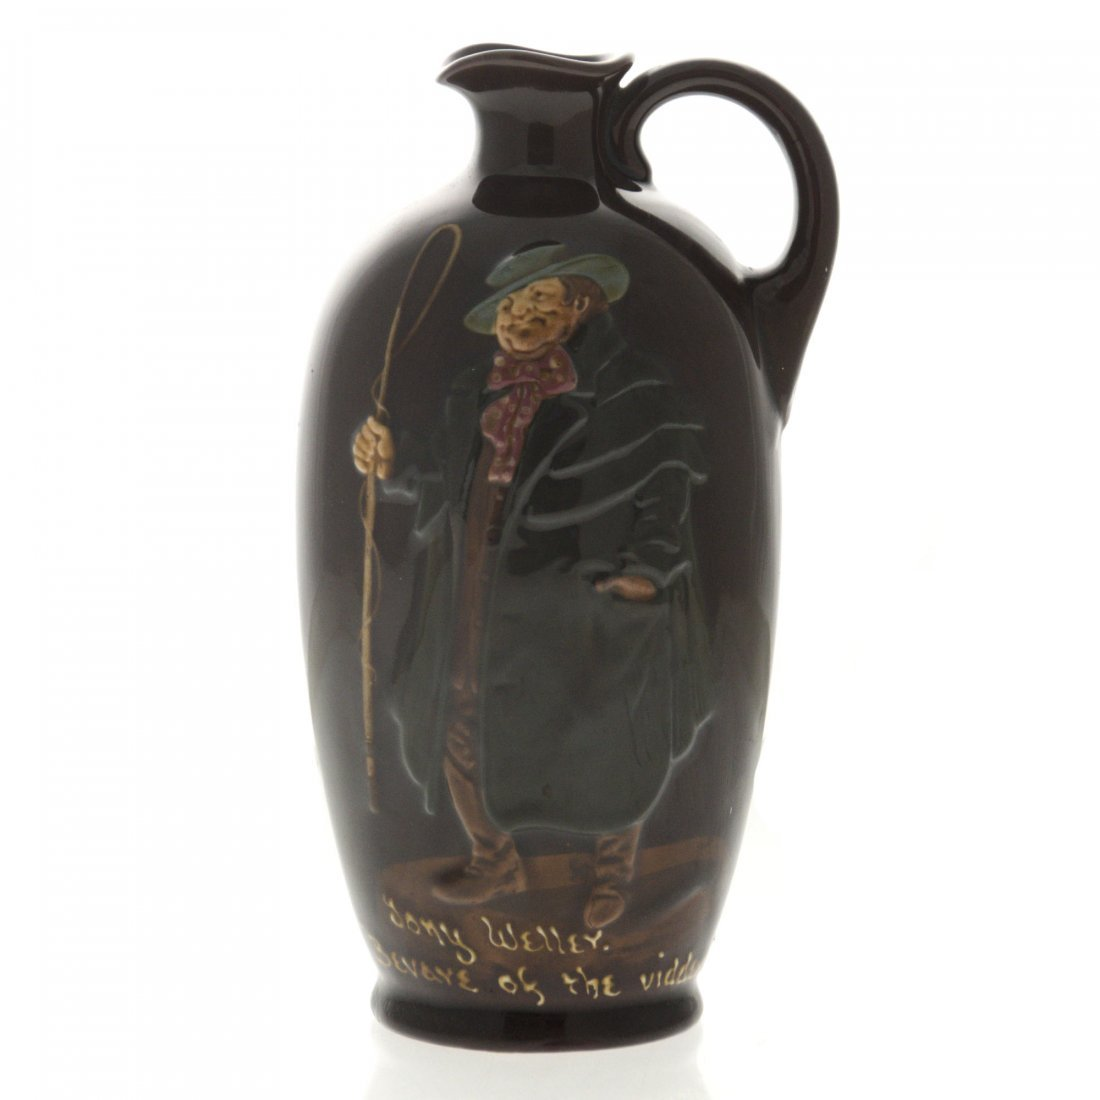 Royal Doulton Dewar's Whisky Tony Weller Ceramic Jug.